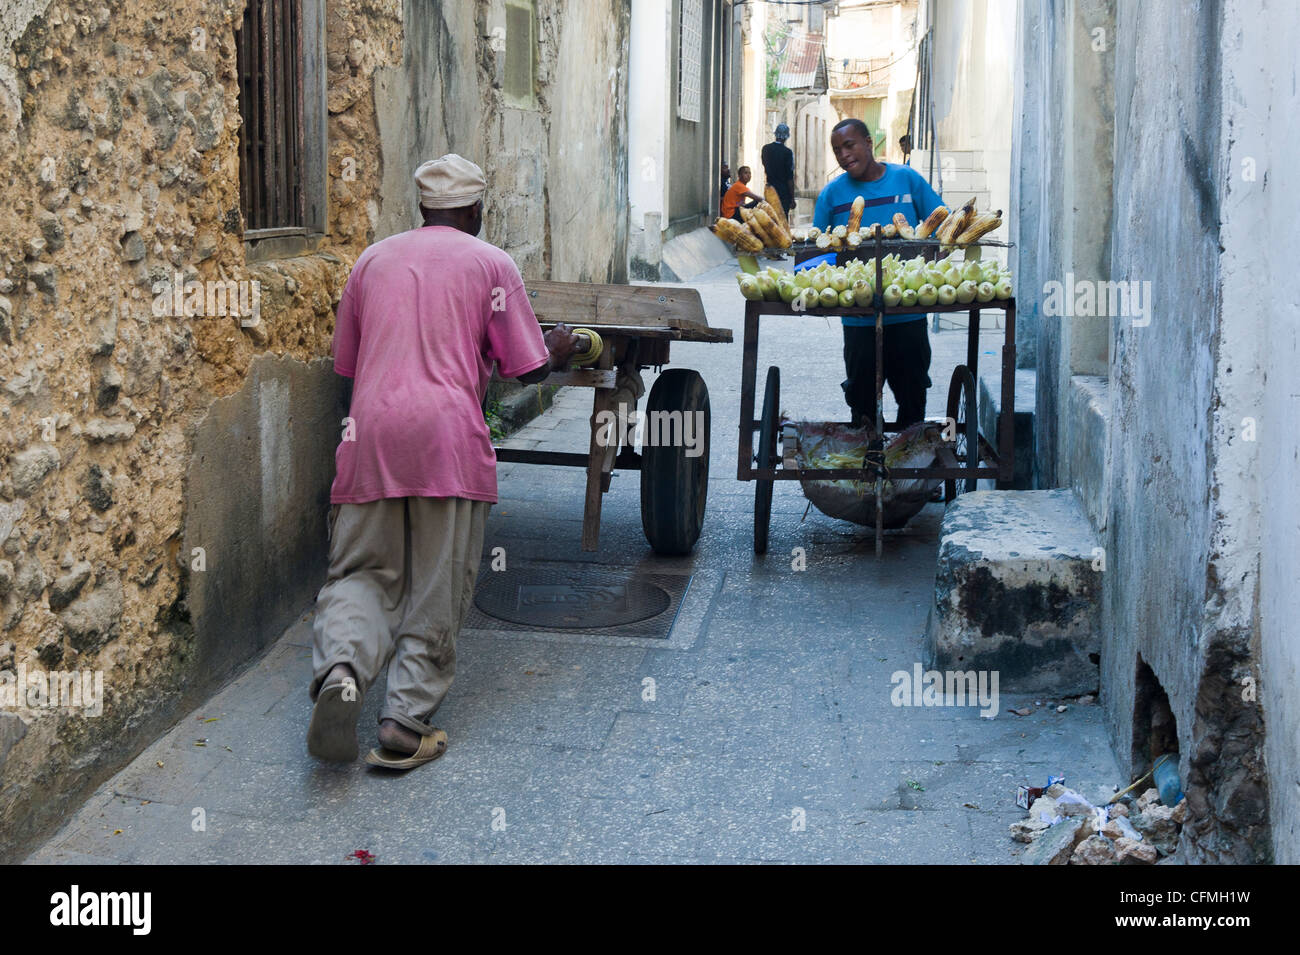 Men pushing carts through the narrow alleys of Stone Town Zanzibar Tanzania - Stock Image